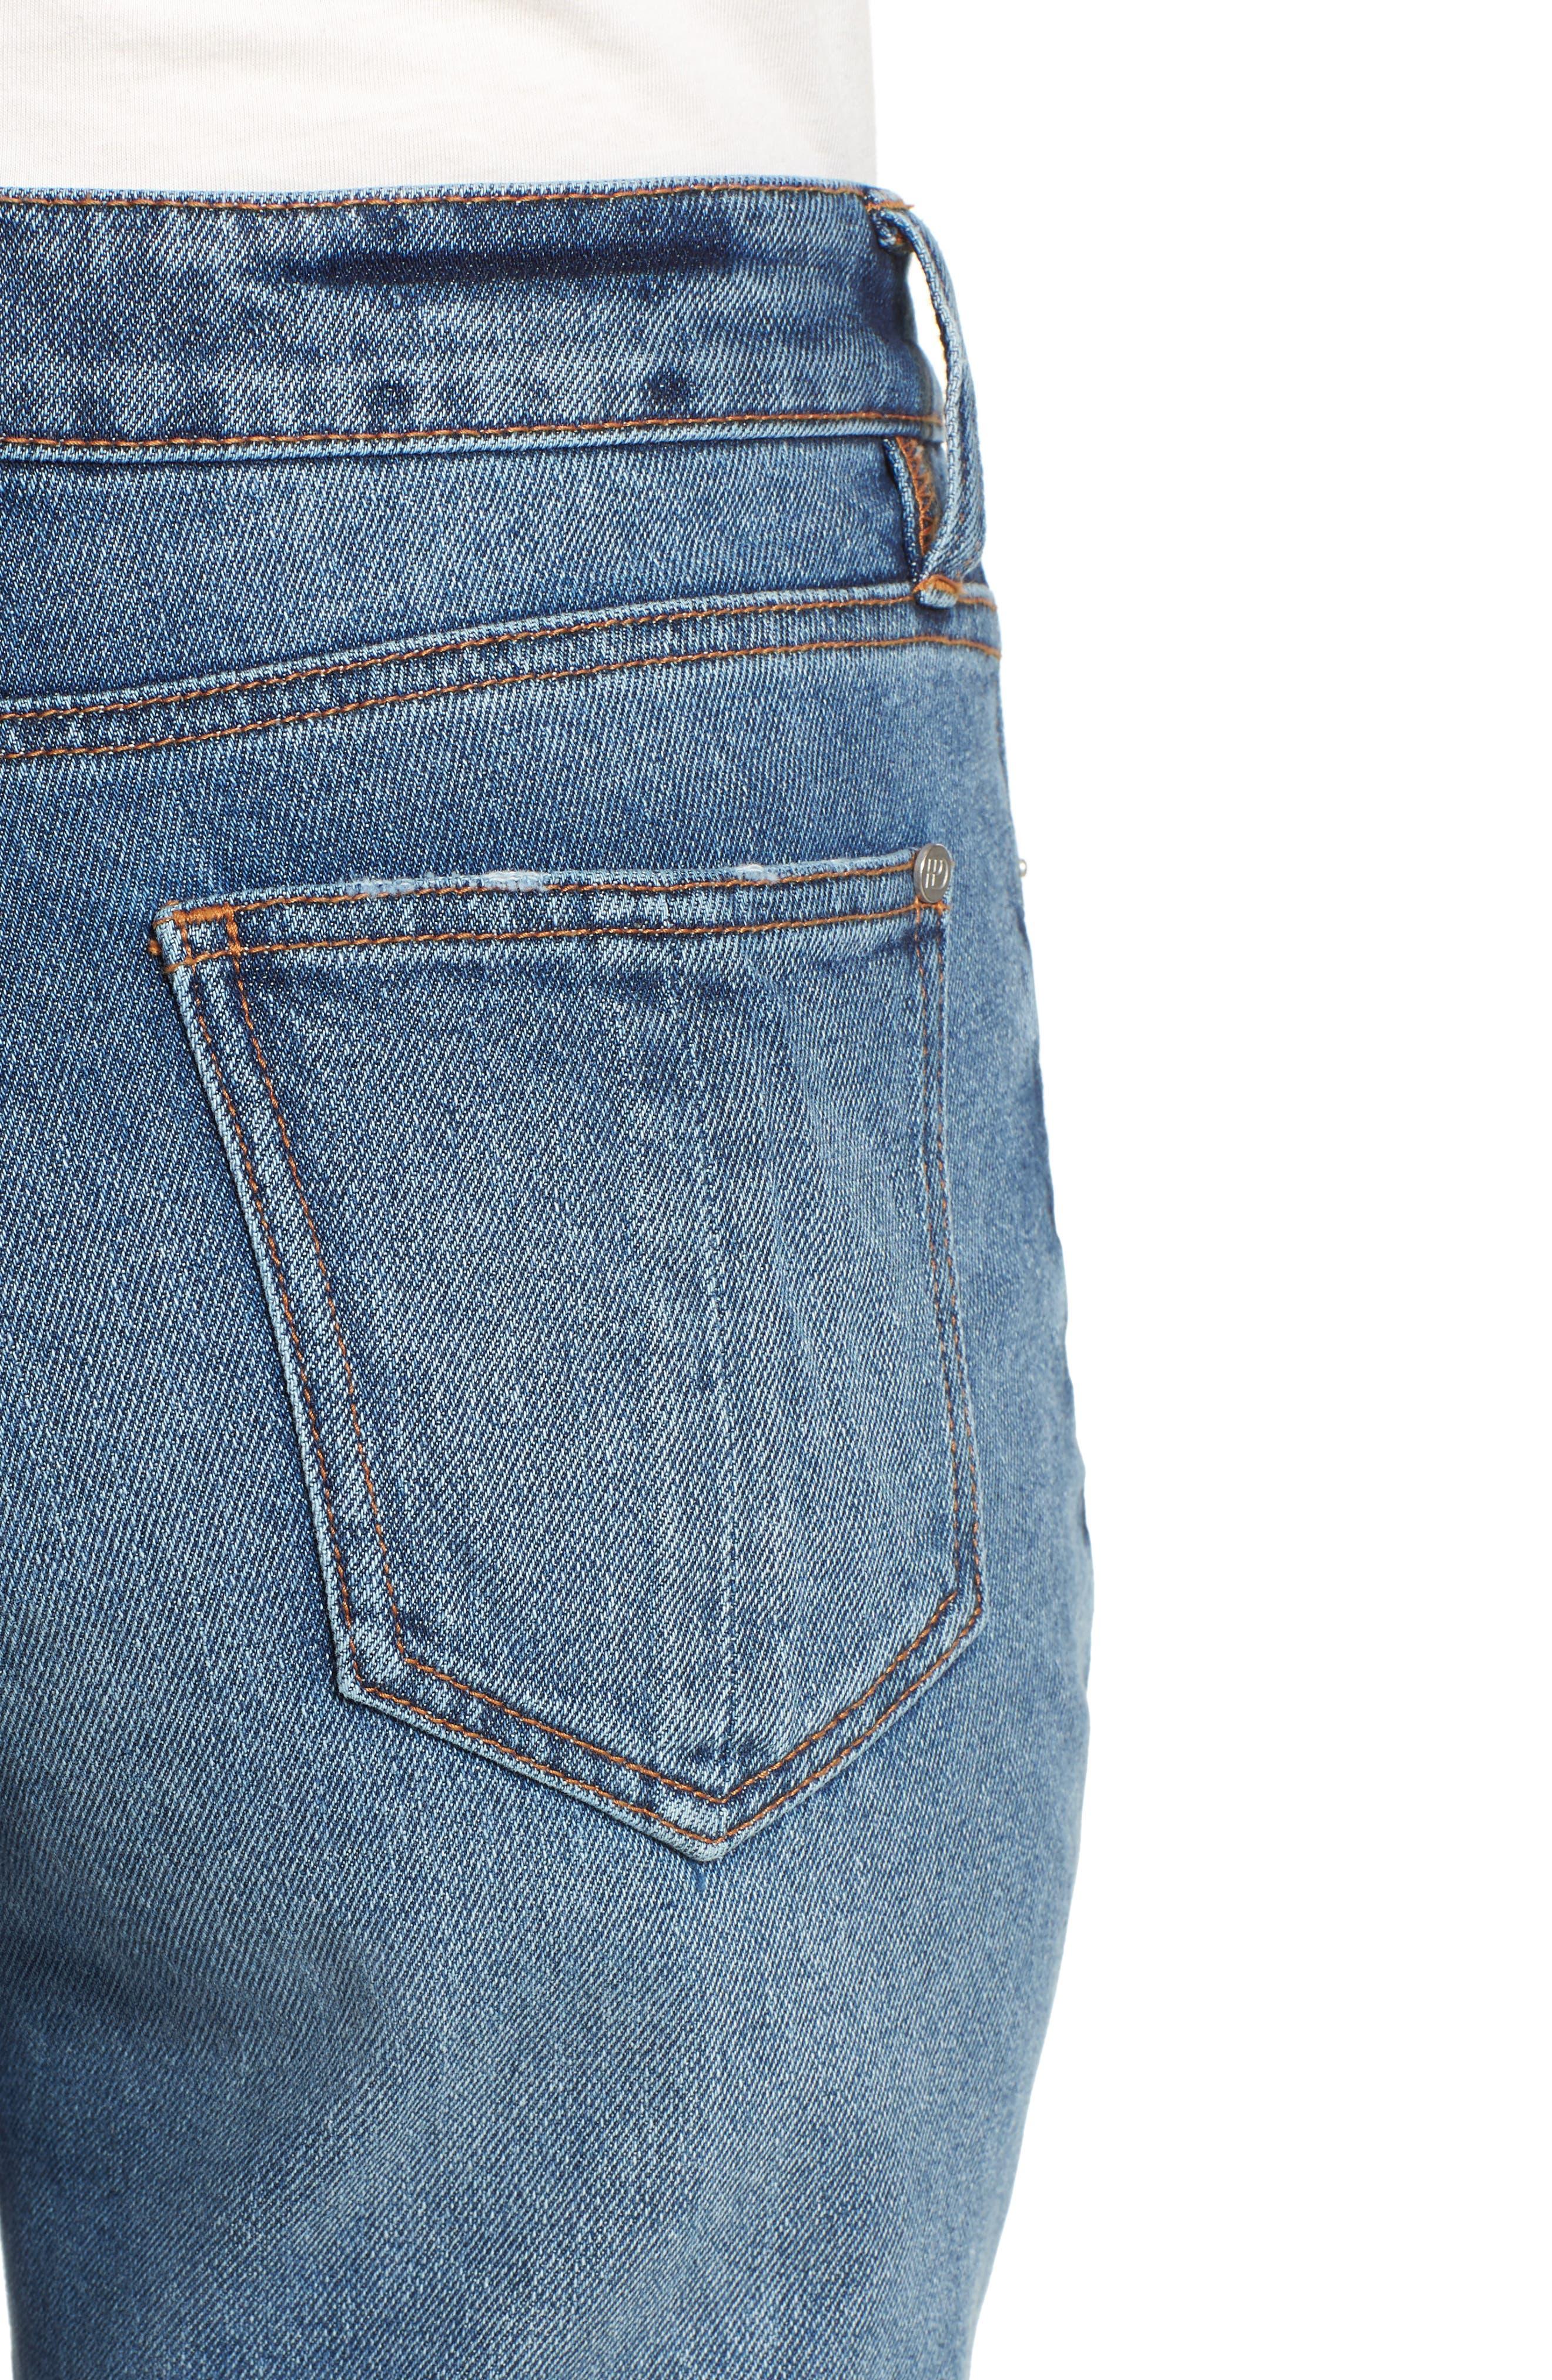 Ankle Straight Leg Jeans,                             Alternate thumbnail 4, color,                             Medium Wash